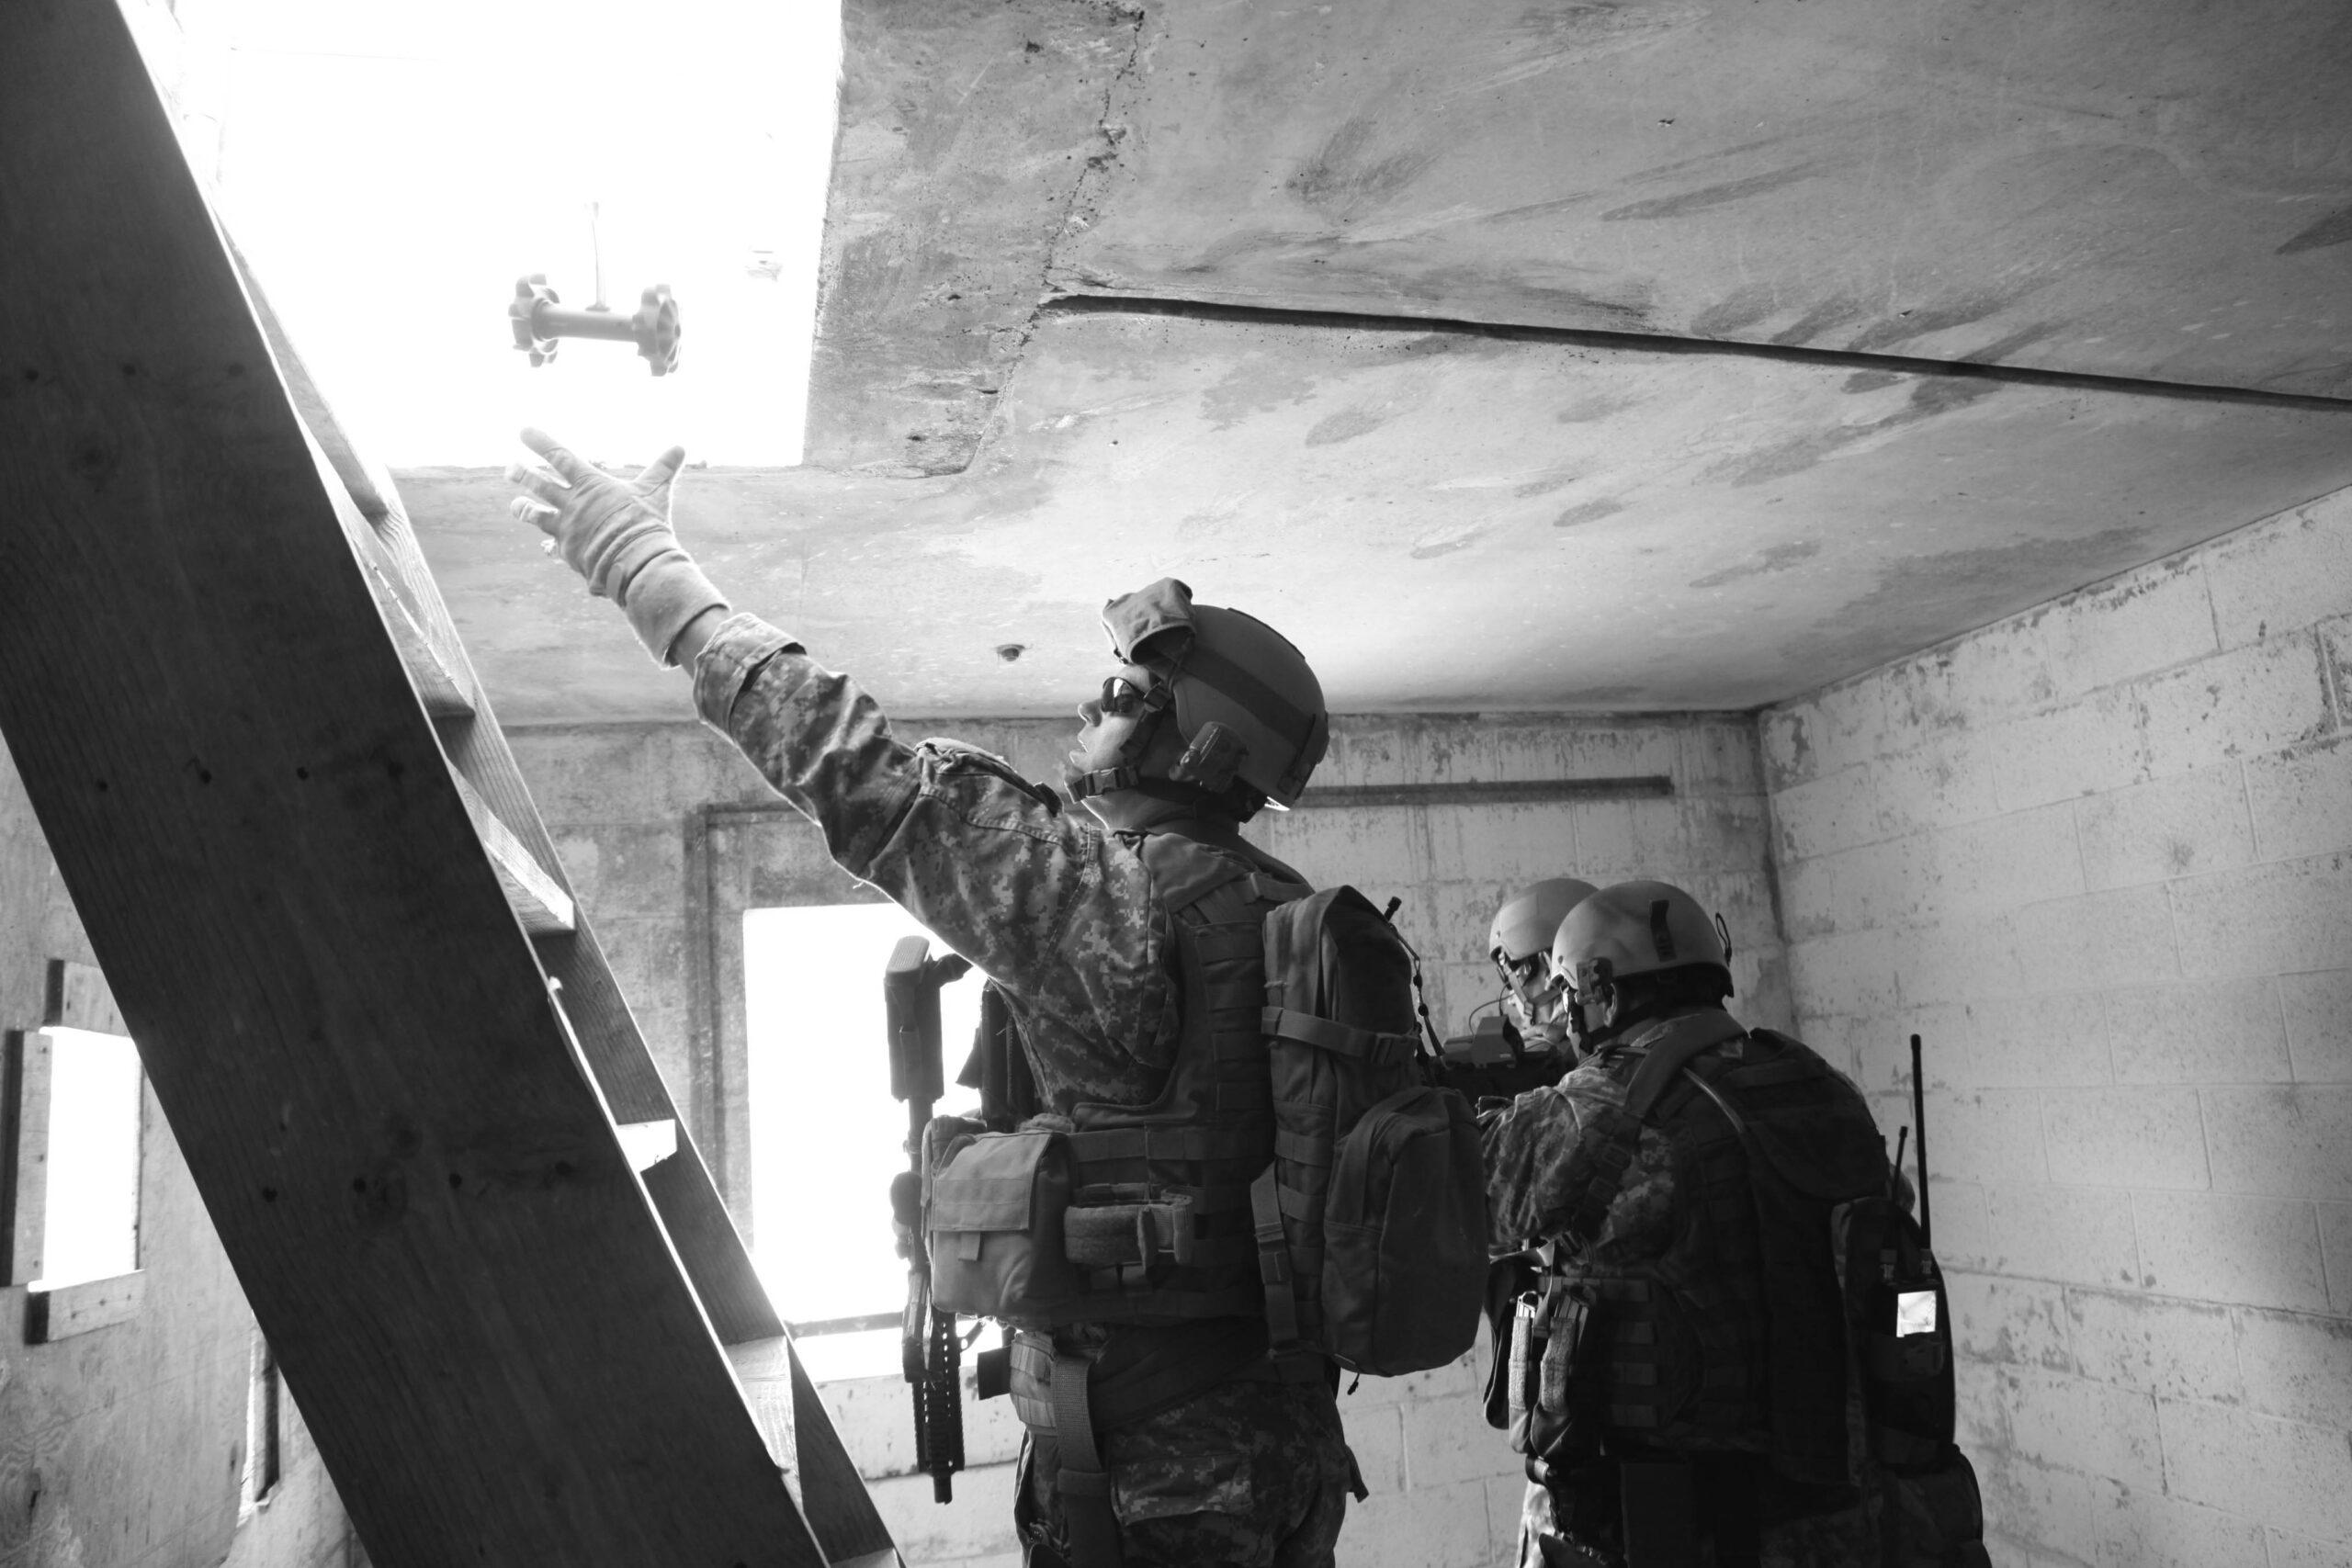 soldier UGV